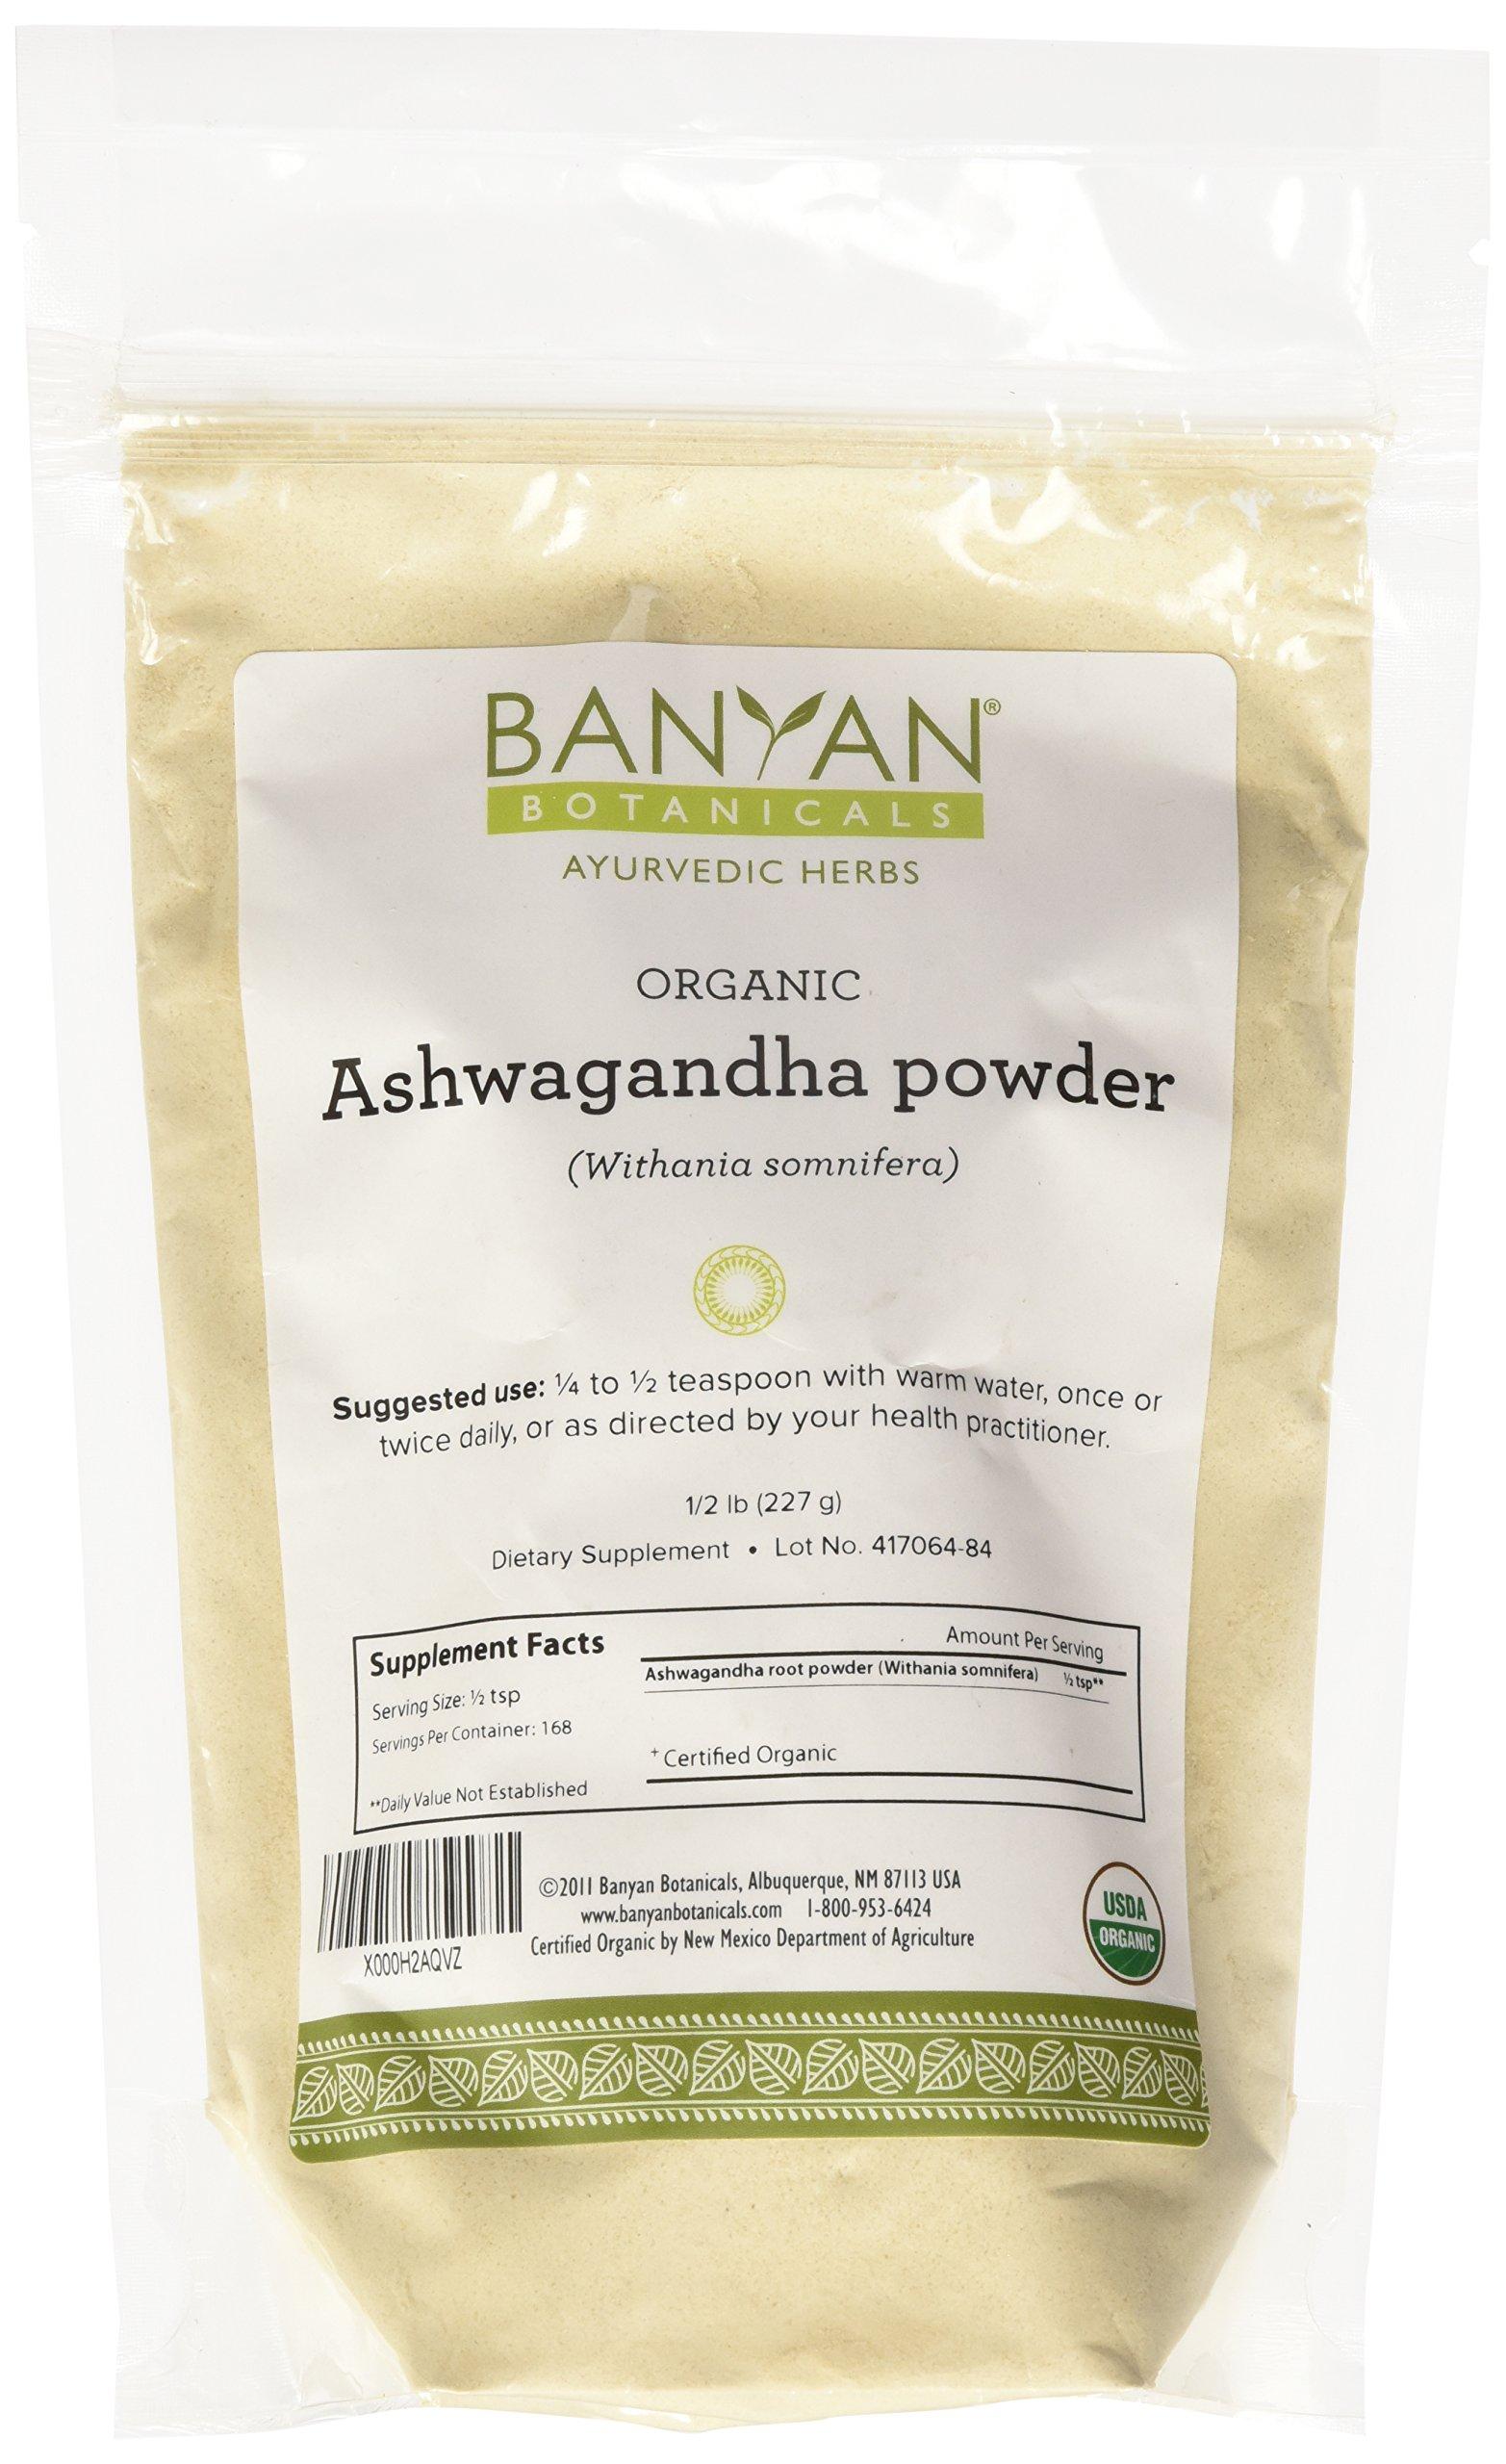 Banyan Botanicals Ashwagandha Powder - USDA Certified Organic, 1/2 Pound - Adaptogenic Ayurvedic Herbal Supplement That Promotes Vitality & Strength - Support for Stress-free Living!